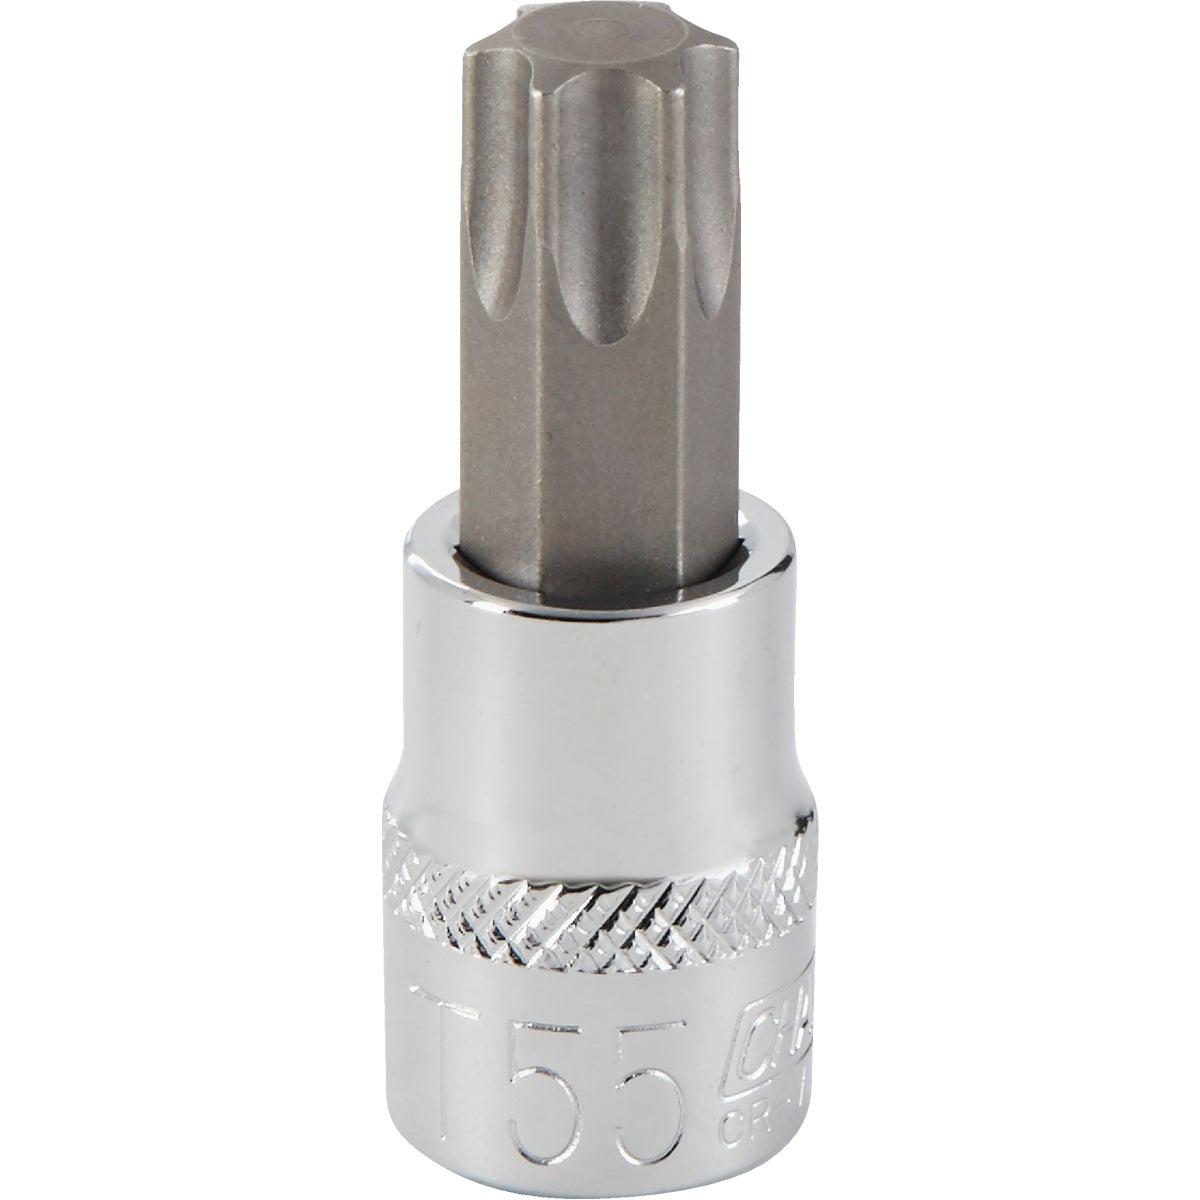 Channellock 3/8 In. Drive Torx Bit Socket, 370908